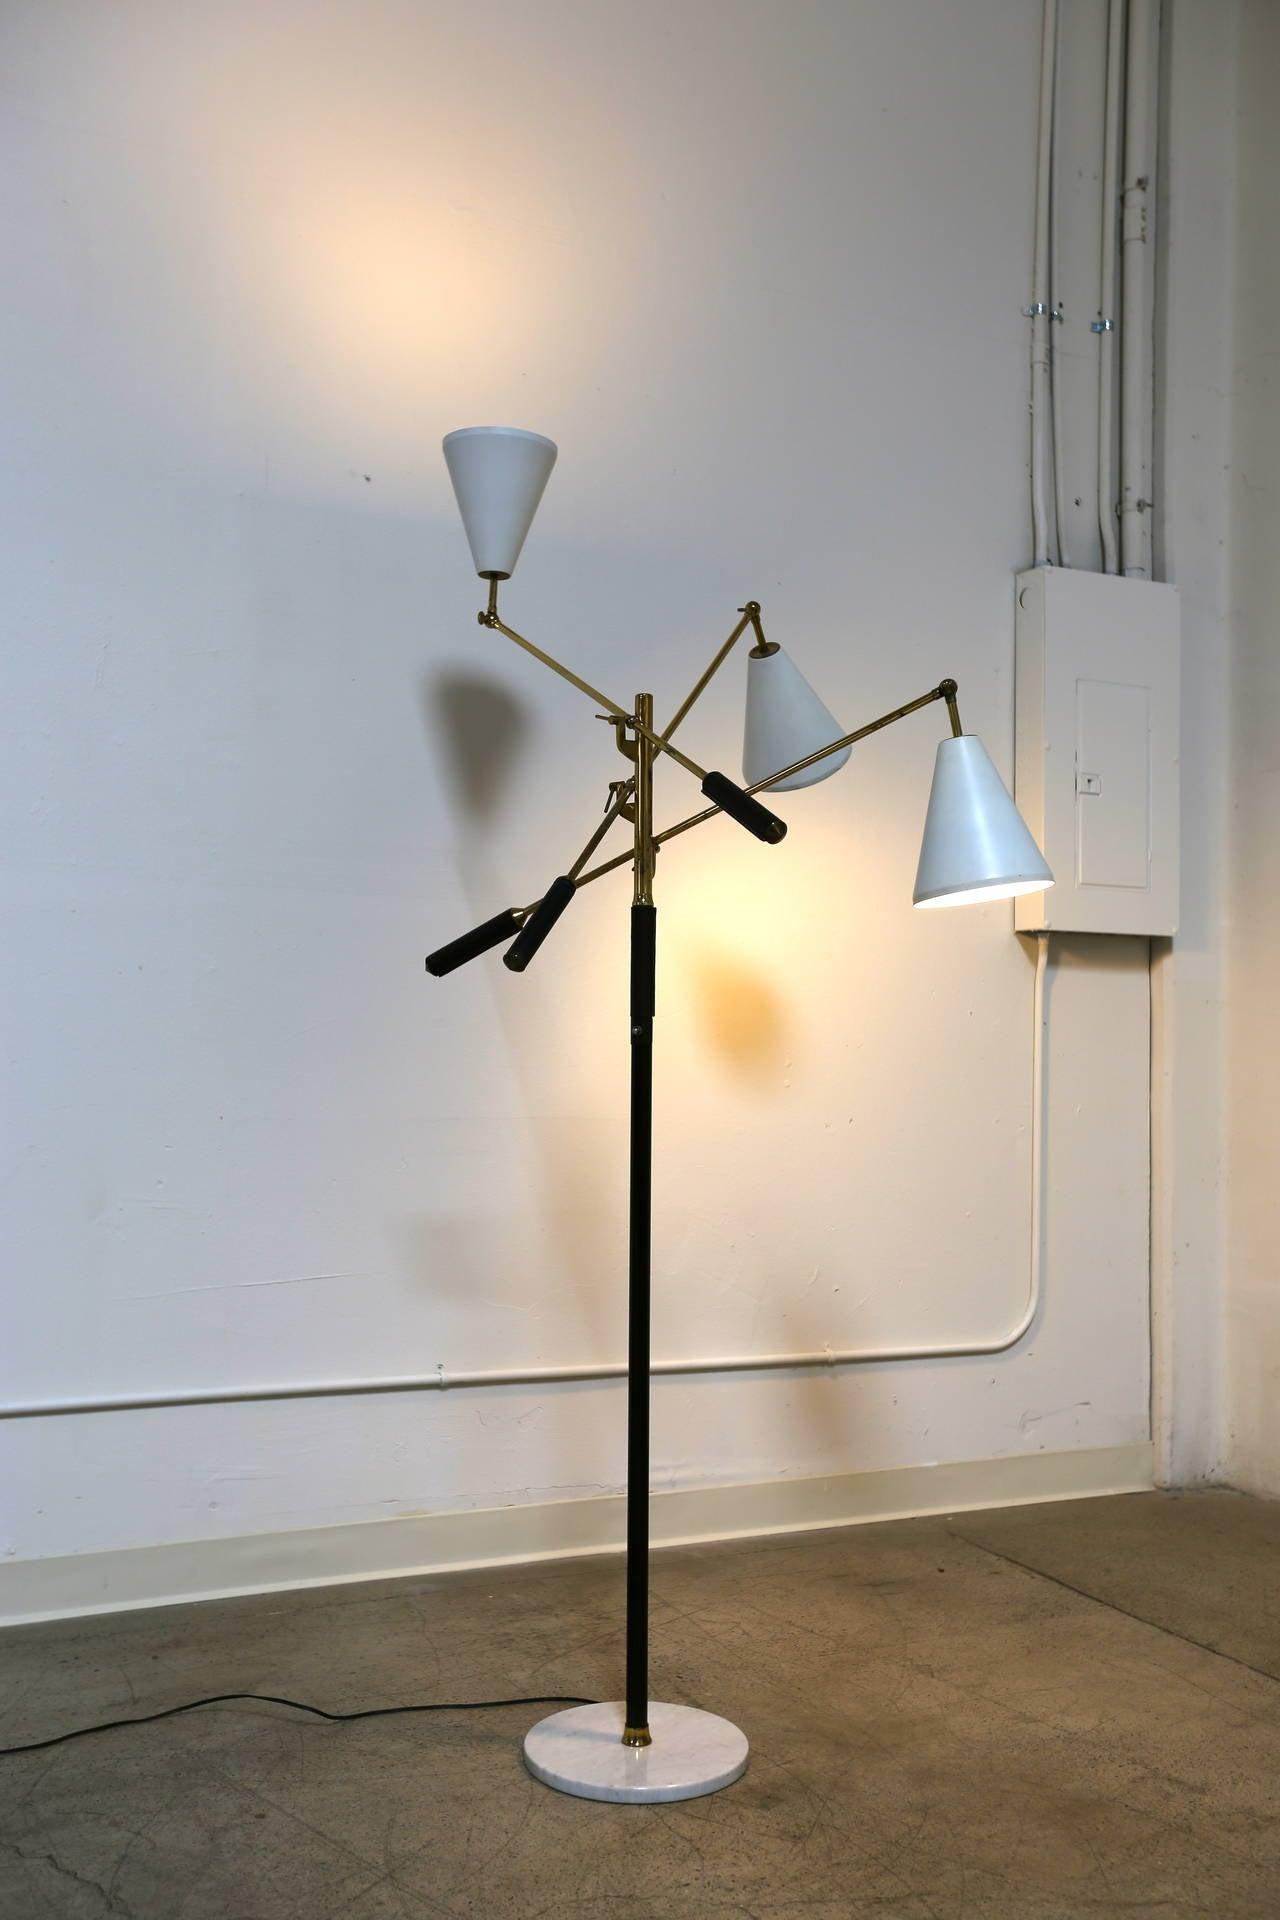 Triennale floor lamp by arredoluce at 1stdibs for Arredo luce